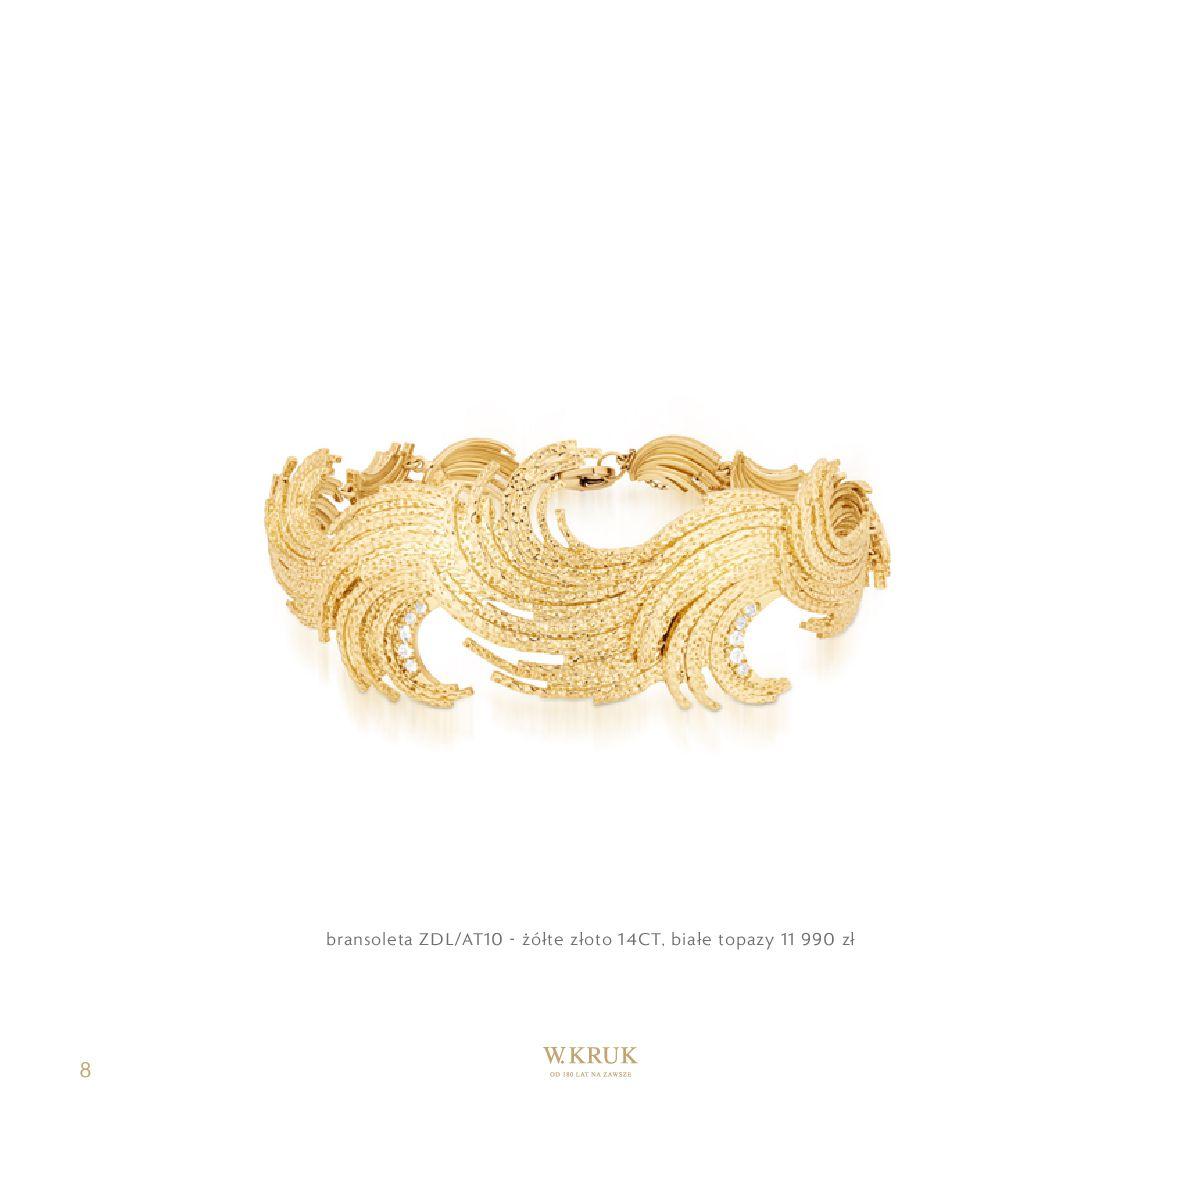 Gazetka W. KRUK: Katalog - Kolekcja Blask 2021-02-17 page-9